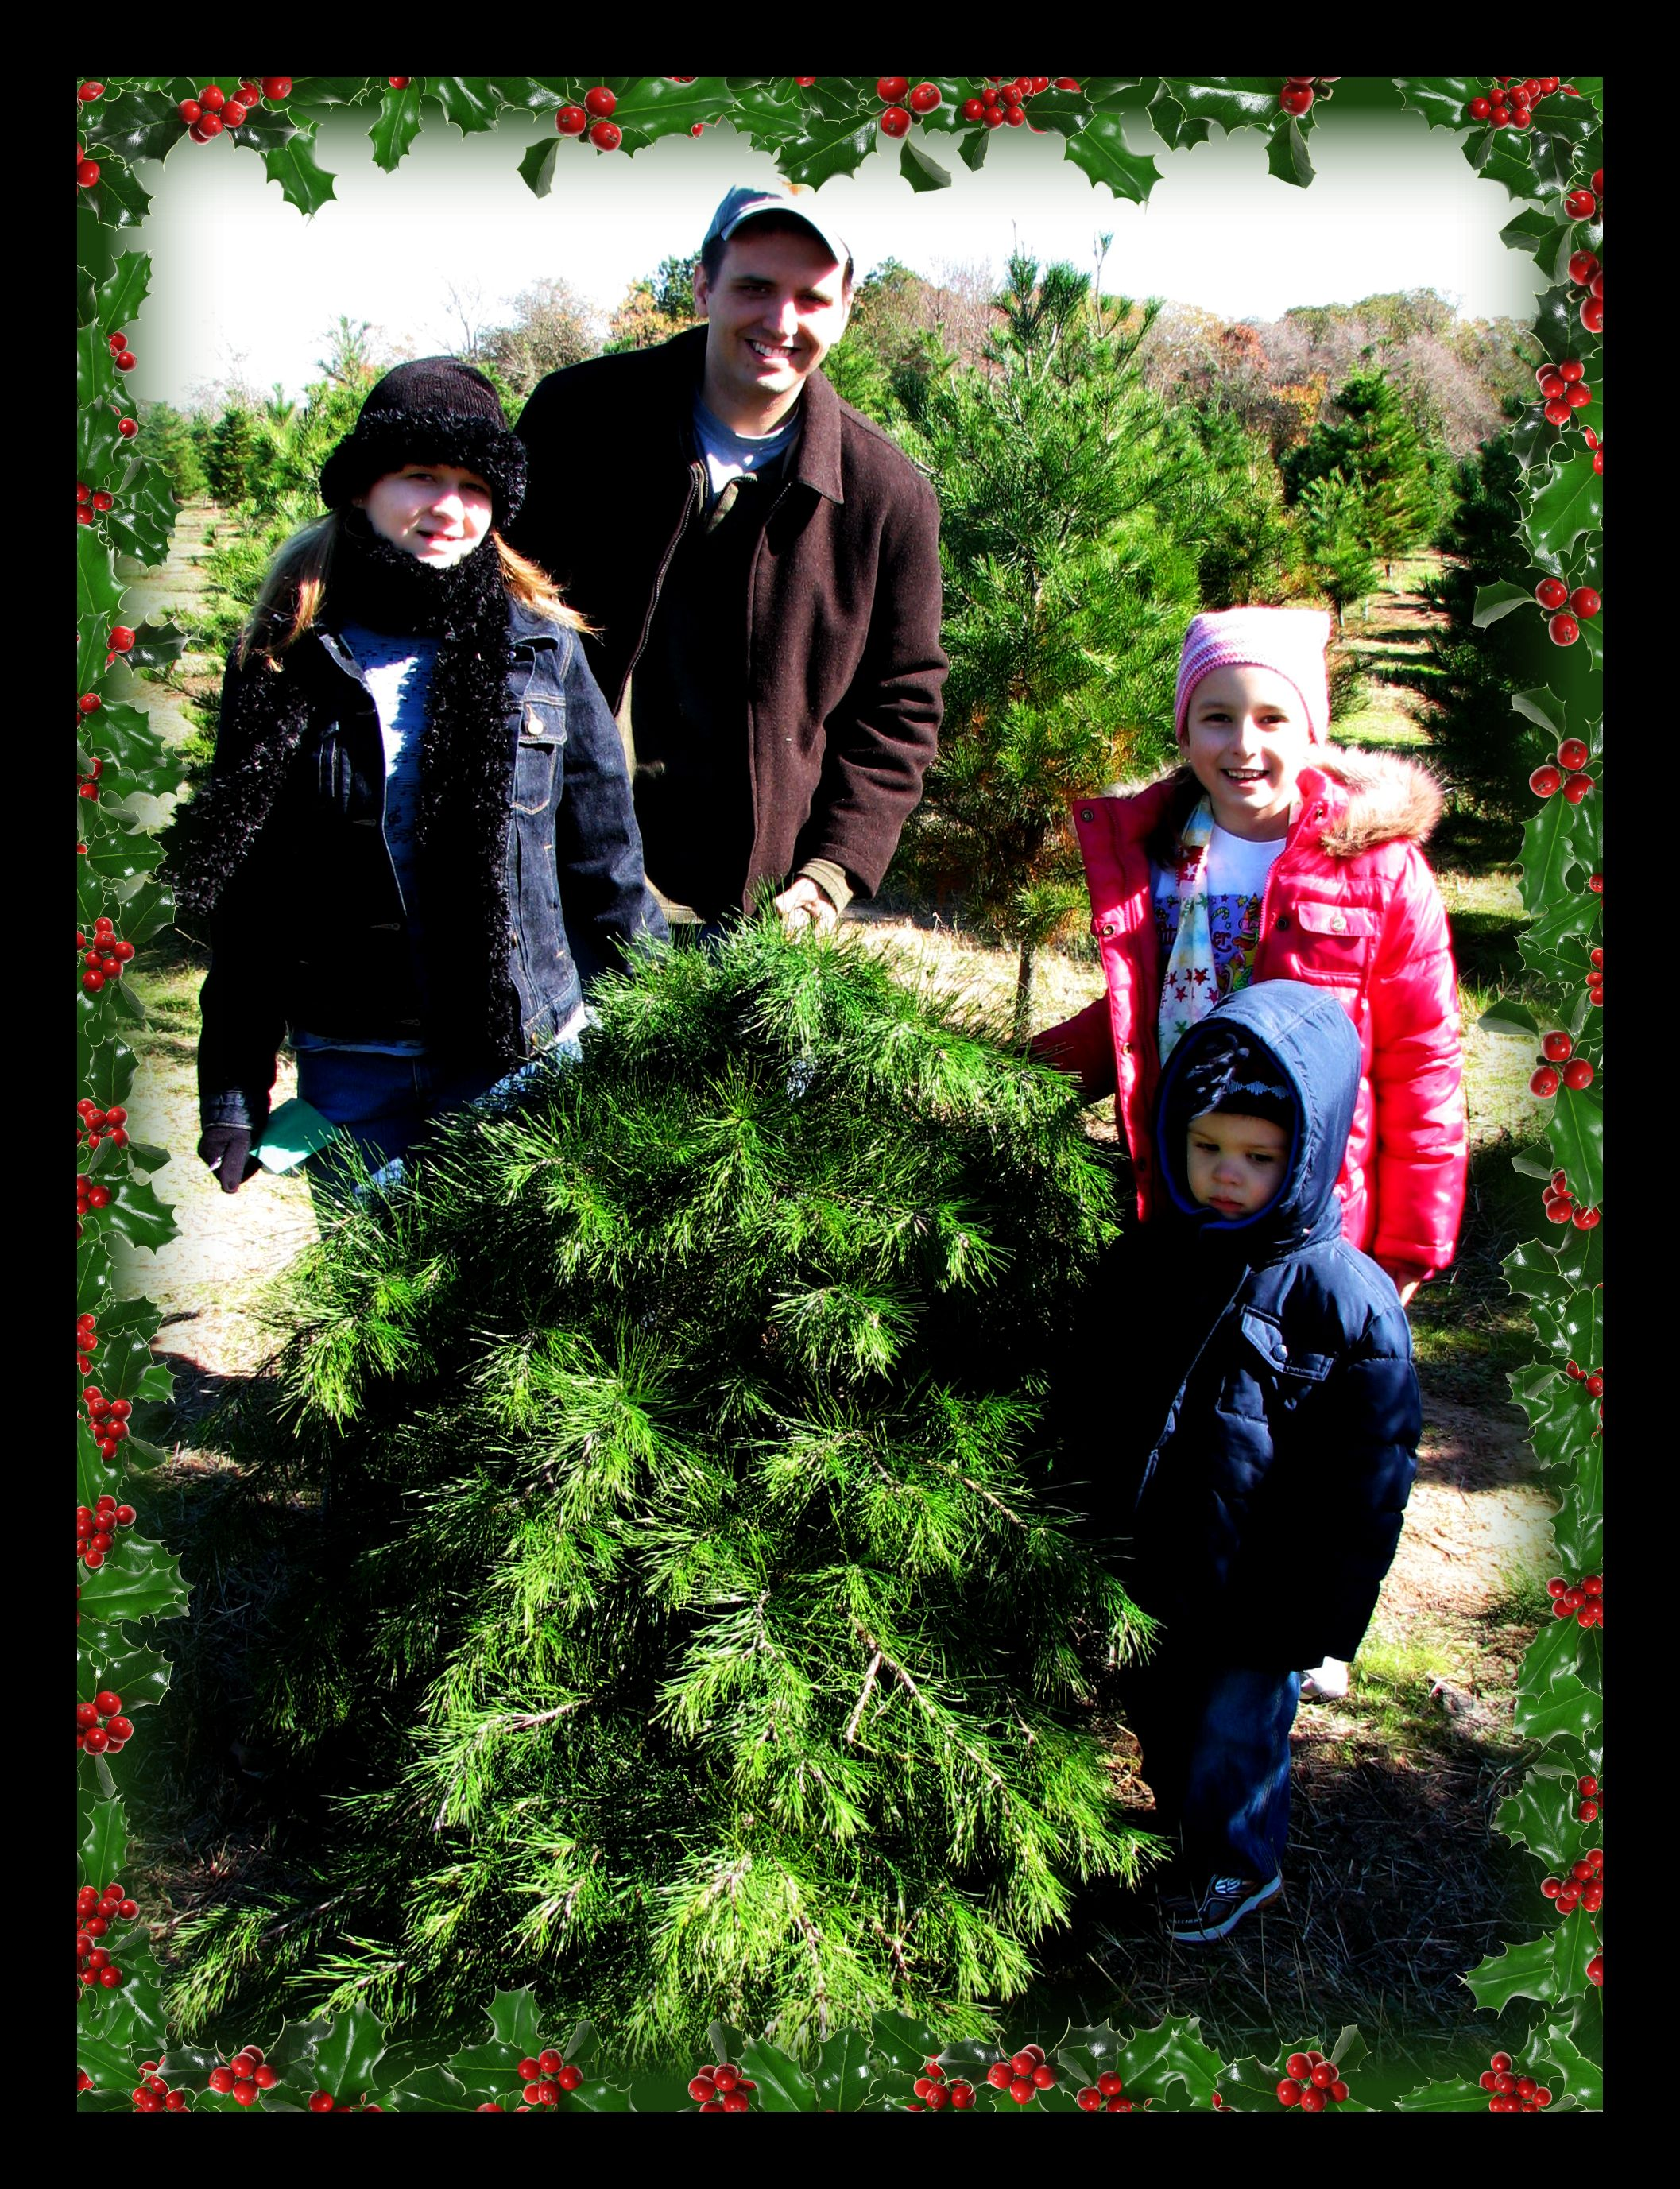 Photos Trip to the Elgin Christmas Tree Farm ZaX1RpOJ